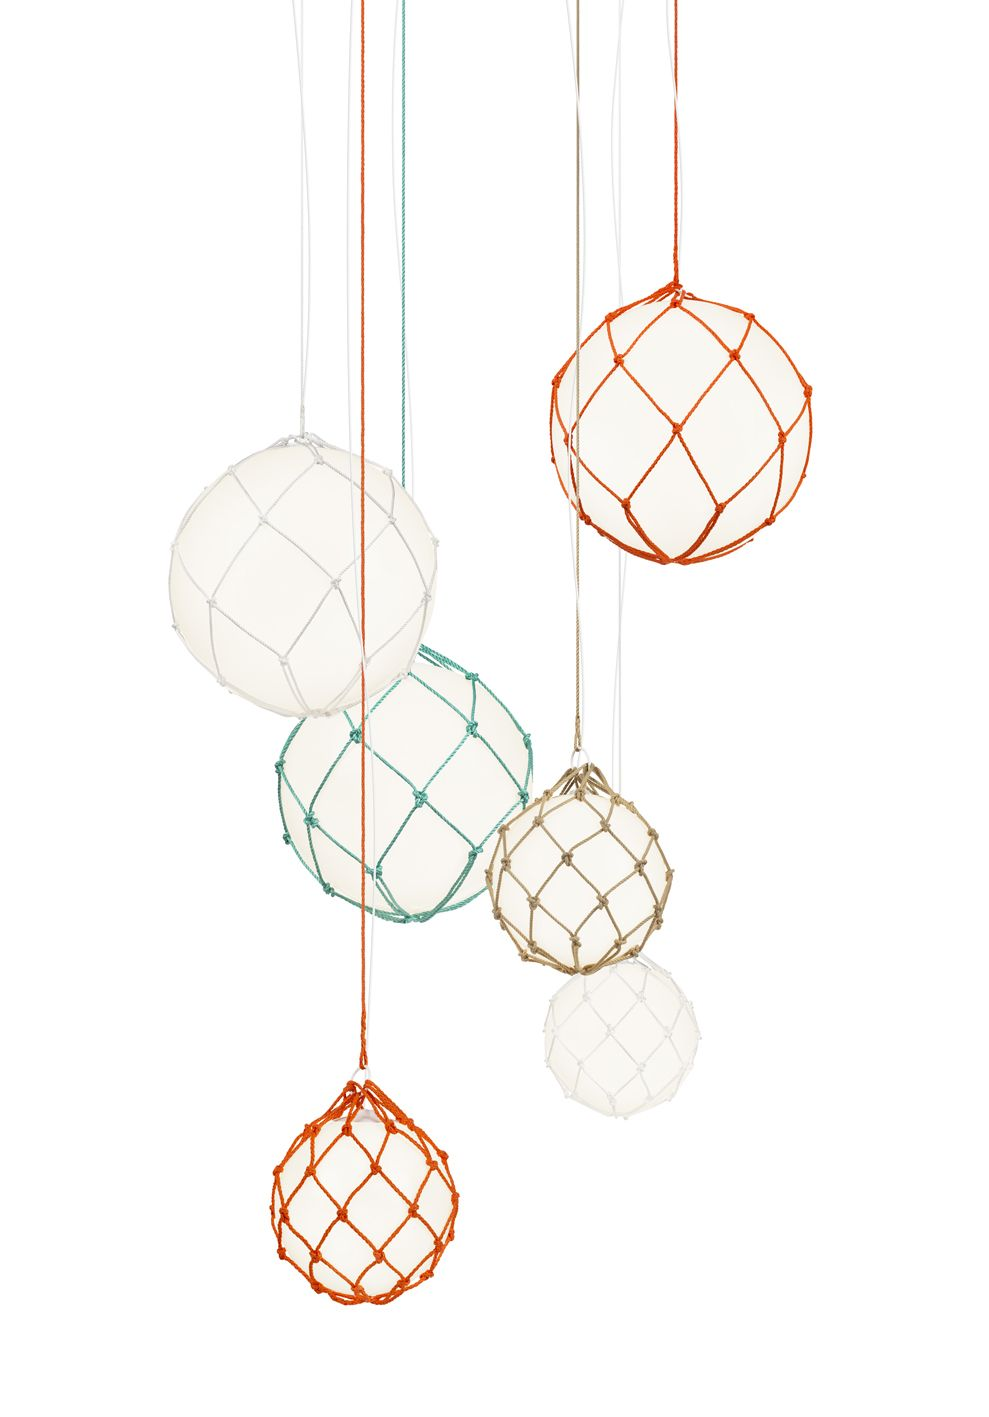 Fisherman Pendant by Mattias Ståhlbom, 2011. Shade in opal acrylic. Handmade net in white, orange or natural.